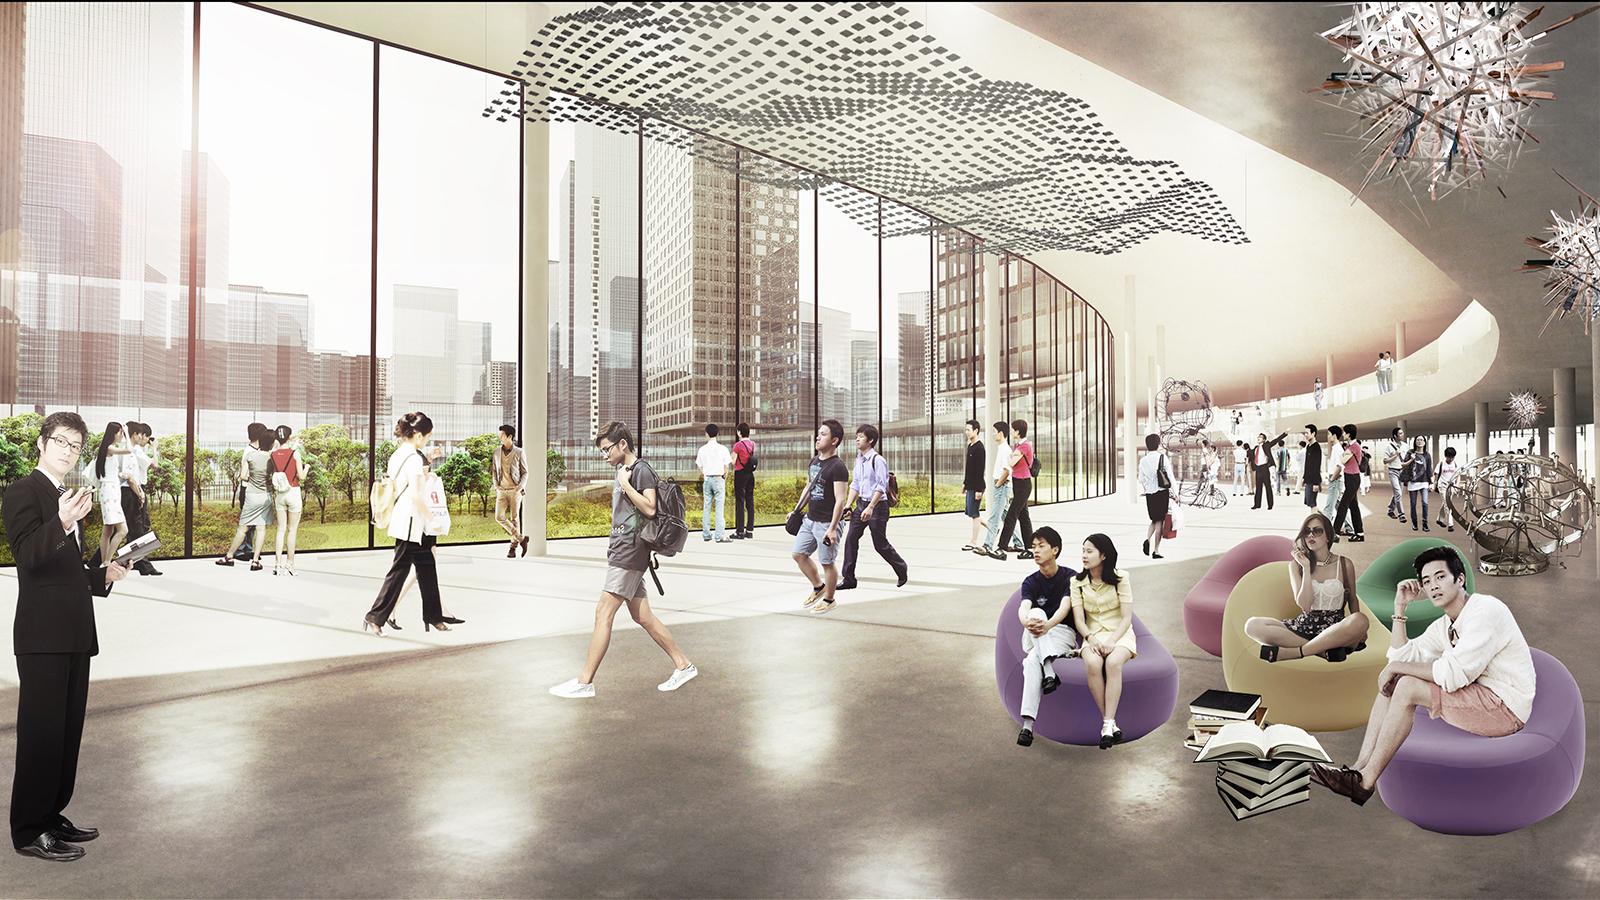 MJZ_Qianhai-Exchange-Plaza (6)